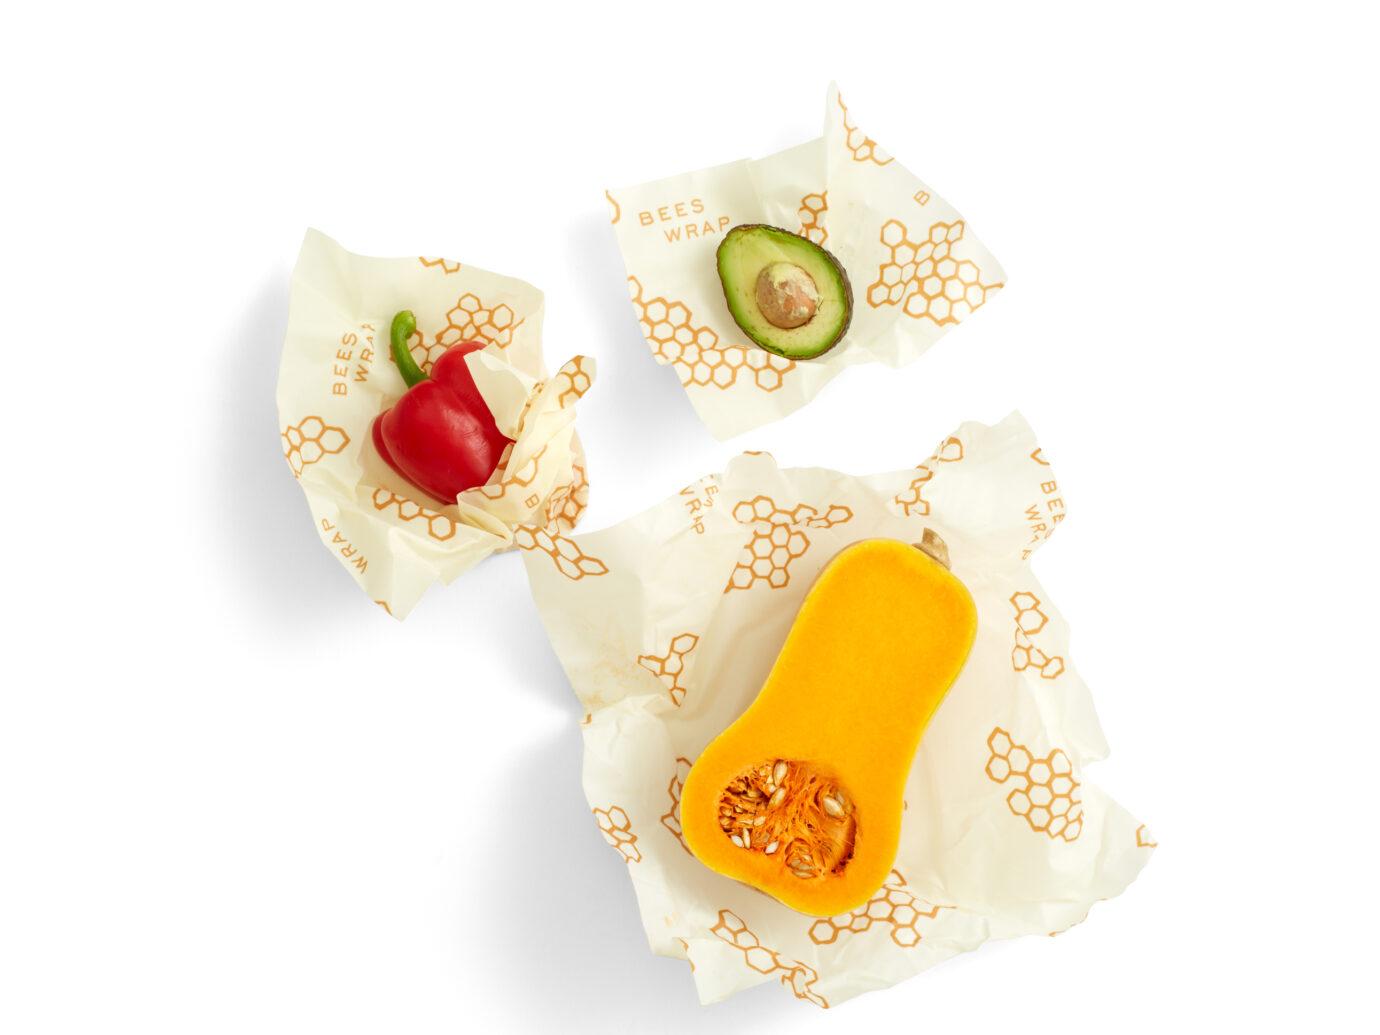 Bees Wrap Reusable Beeswax Food Wraps